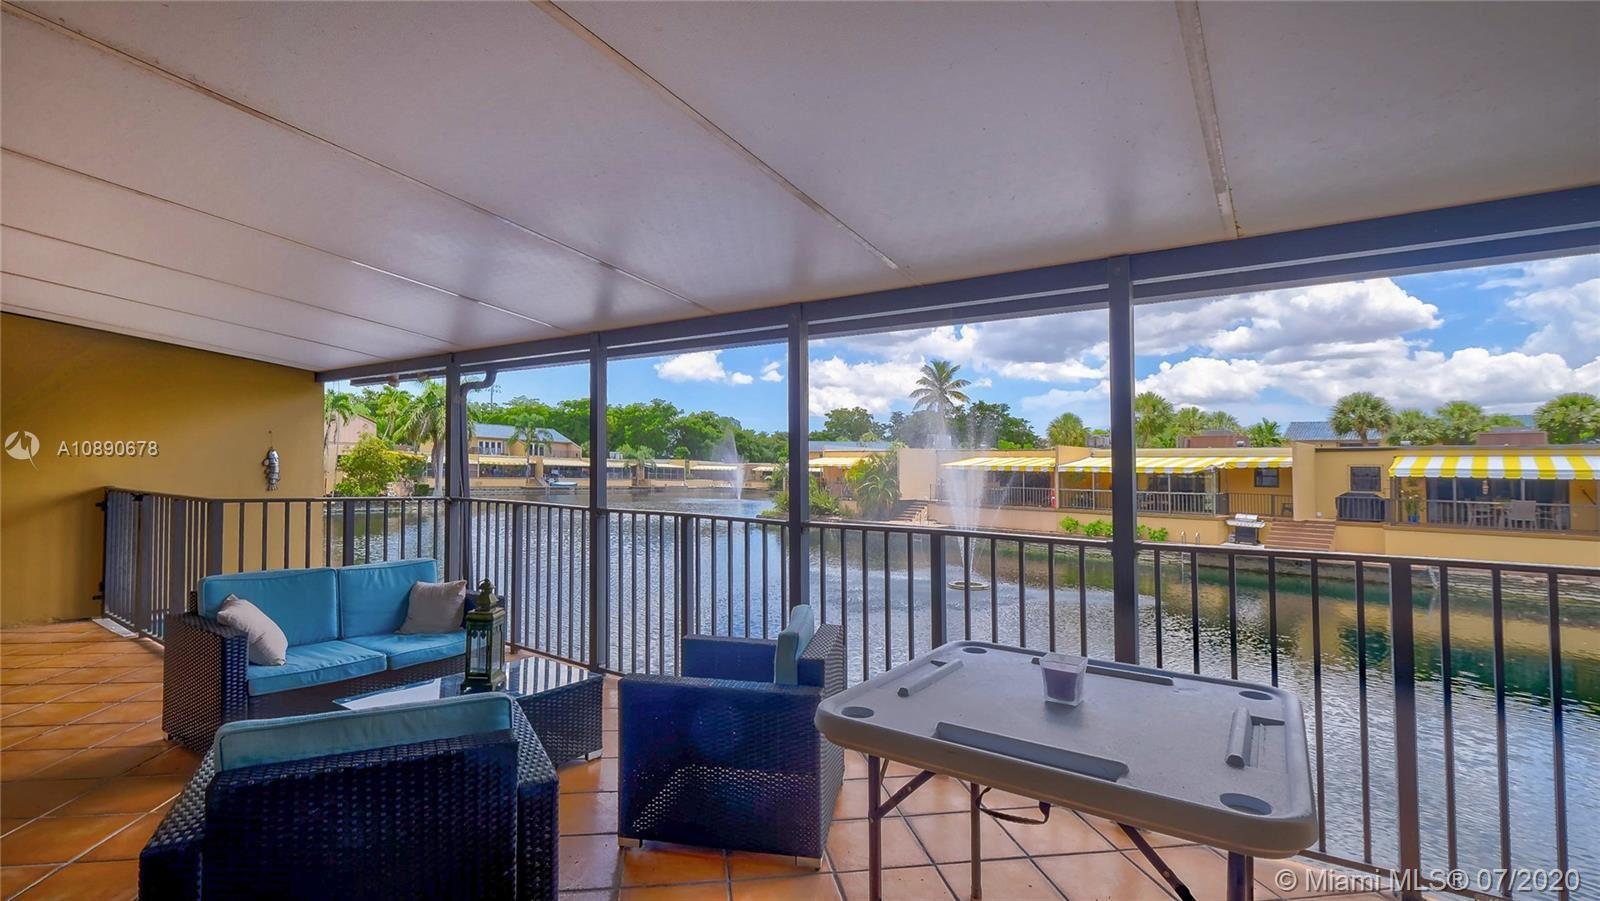 16105 Kingsmoor Way #16105, Miami Lakes, FL 33014 - #: A10890678